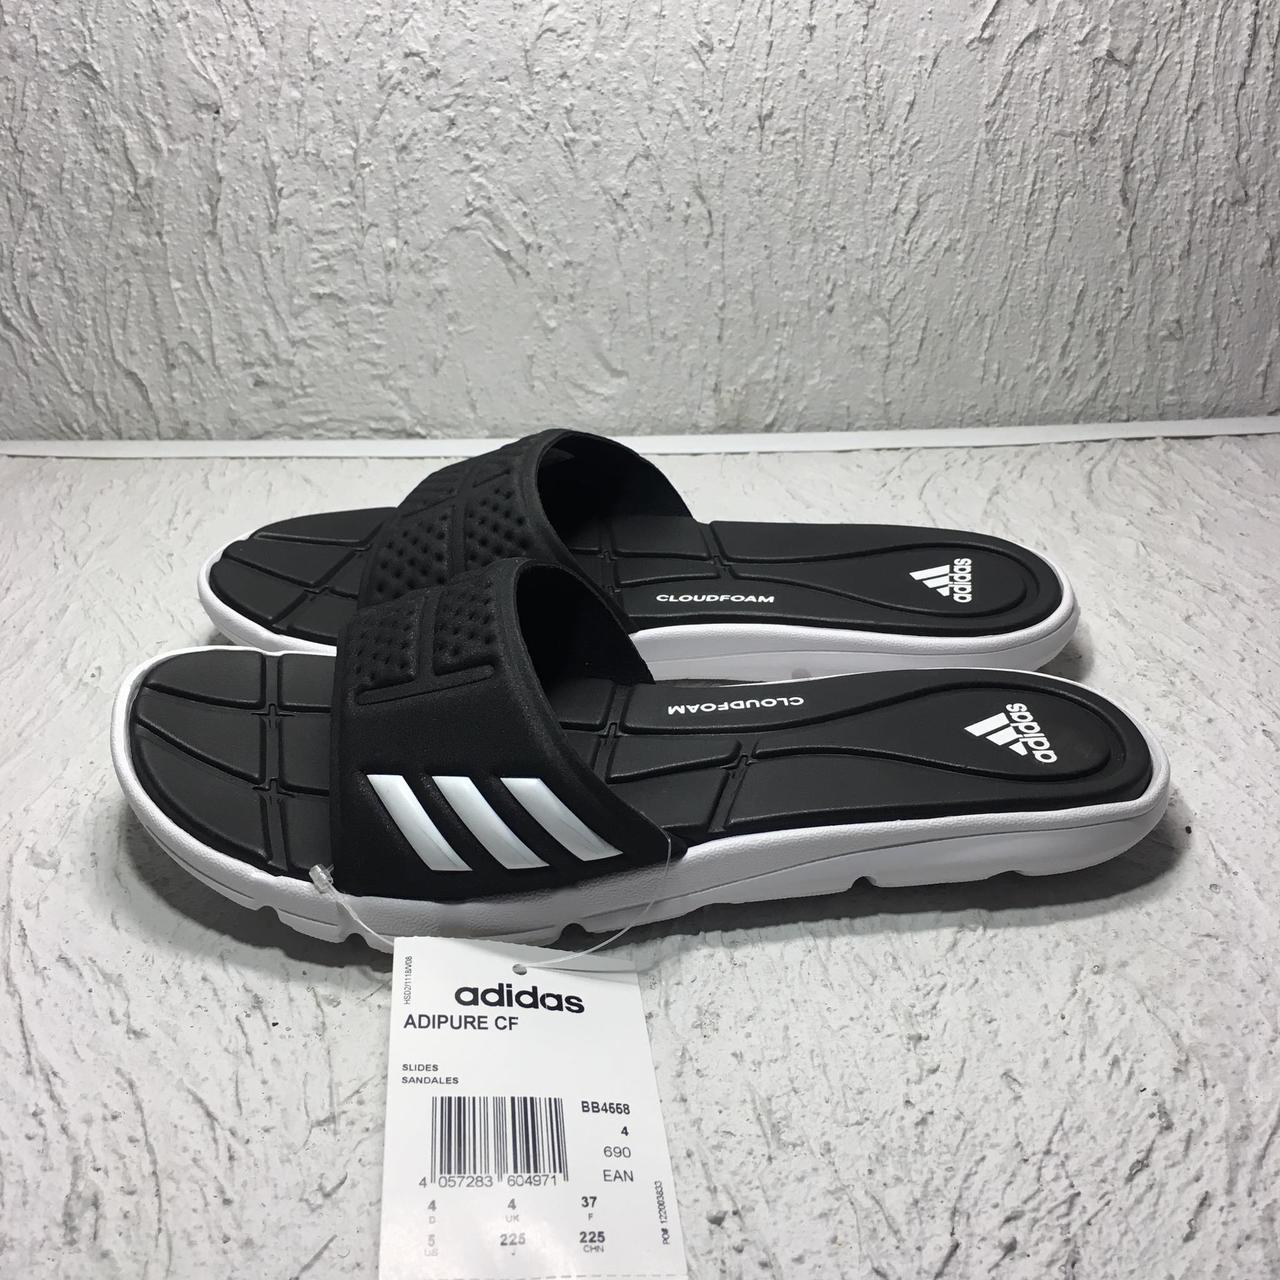 Женские Сланцы Adidas ADIPURE CF W BB4558 37 размер